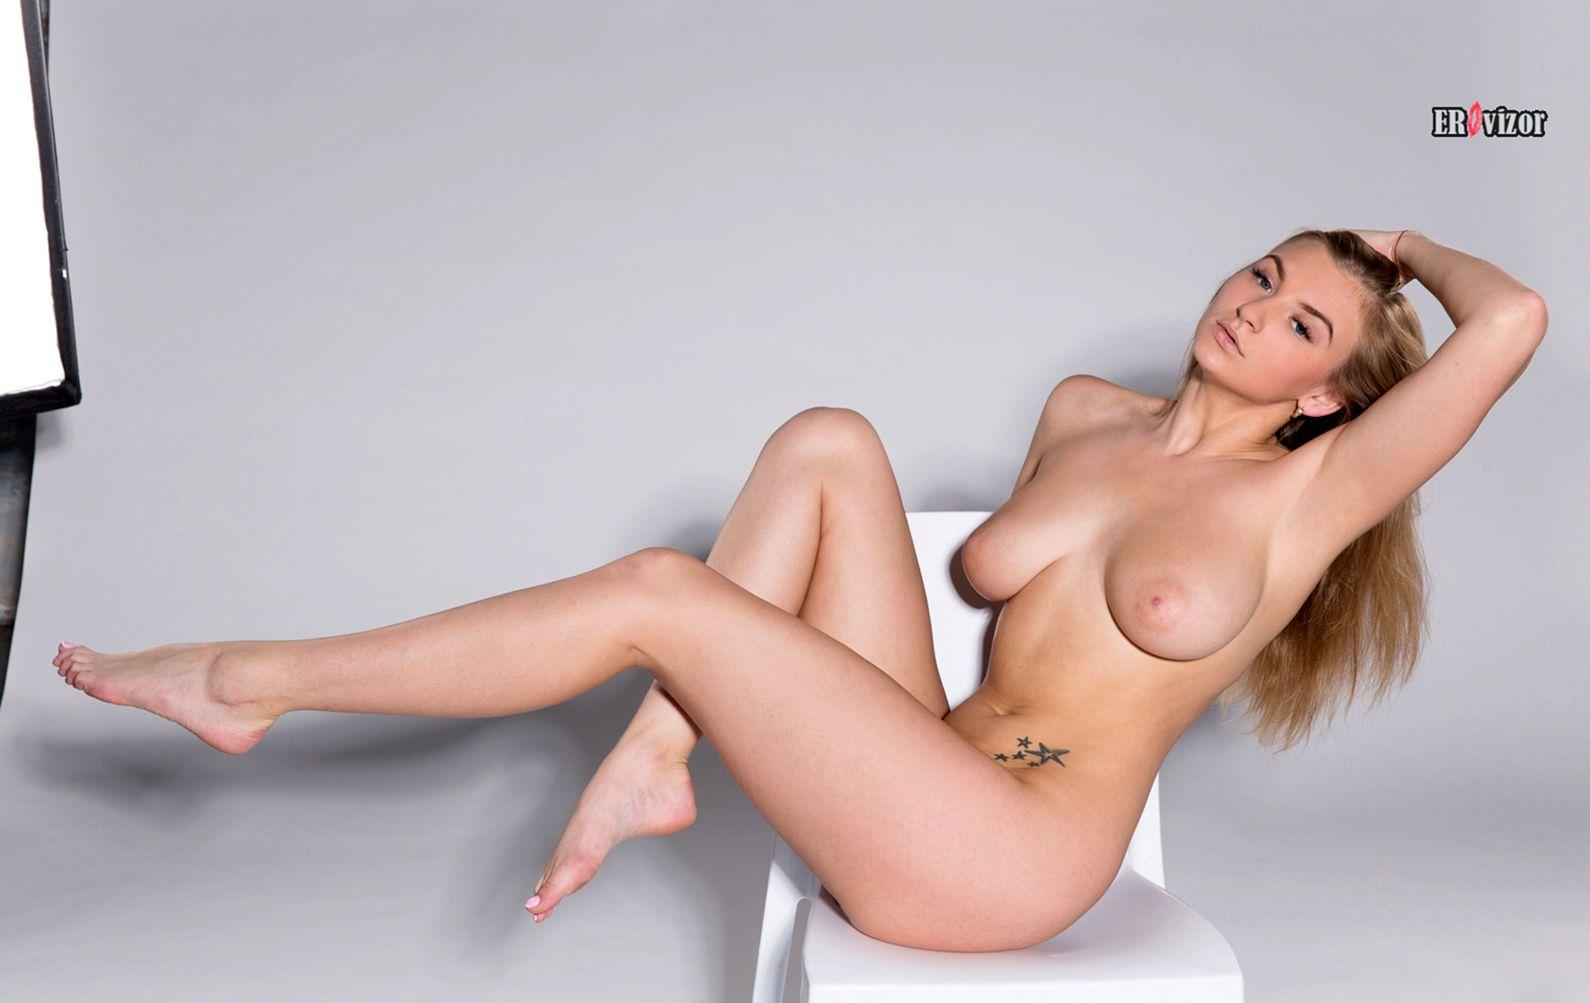 laury украинская голая девушка